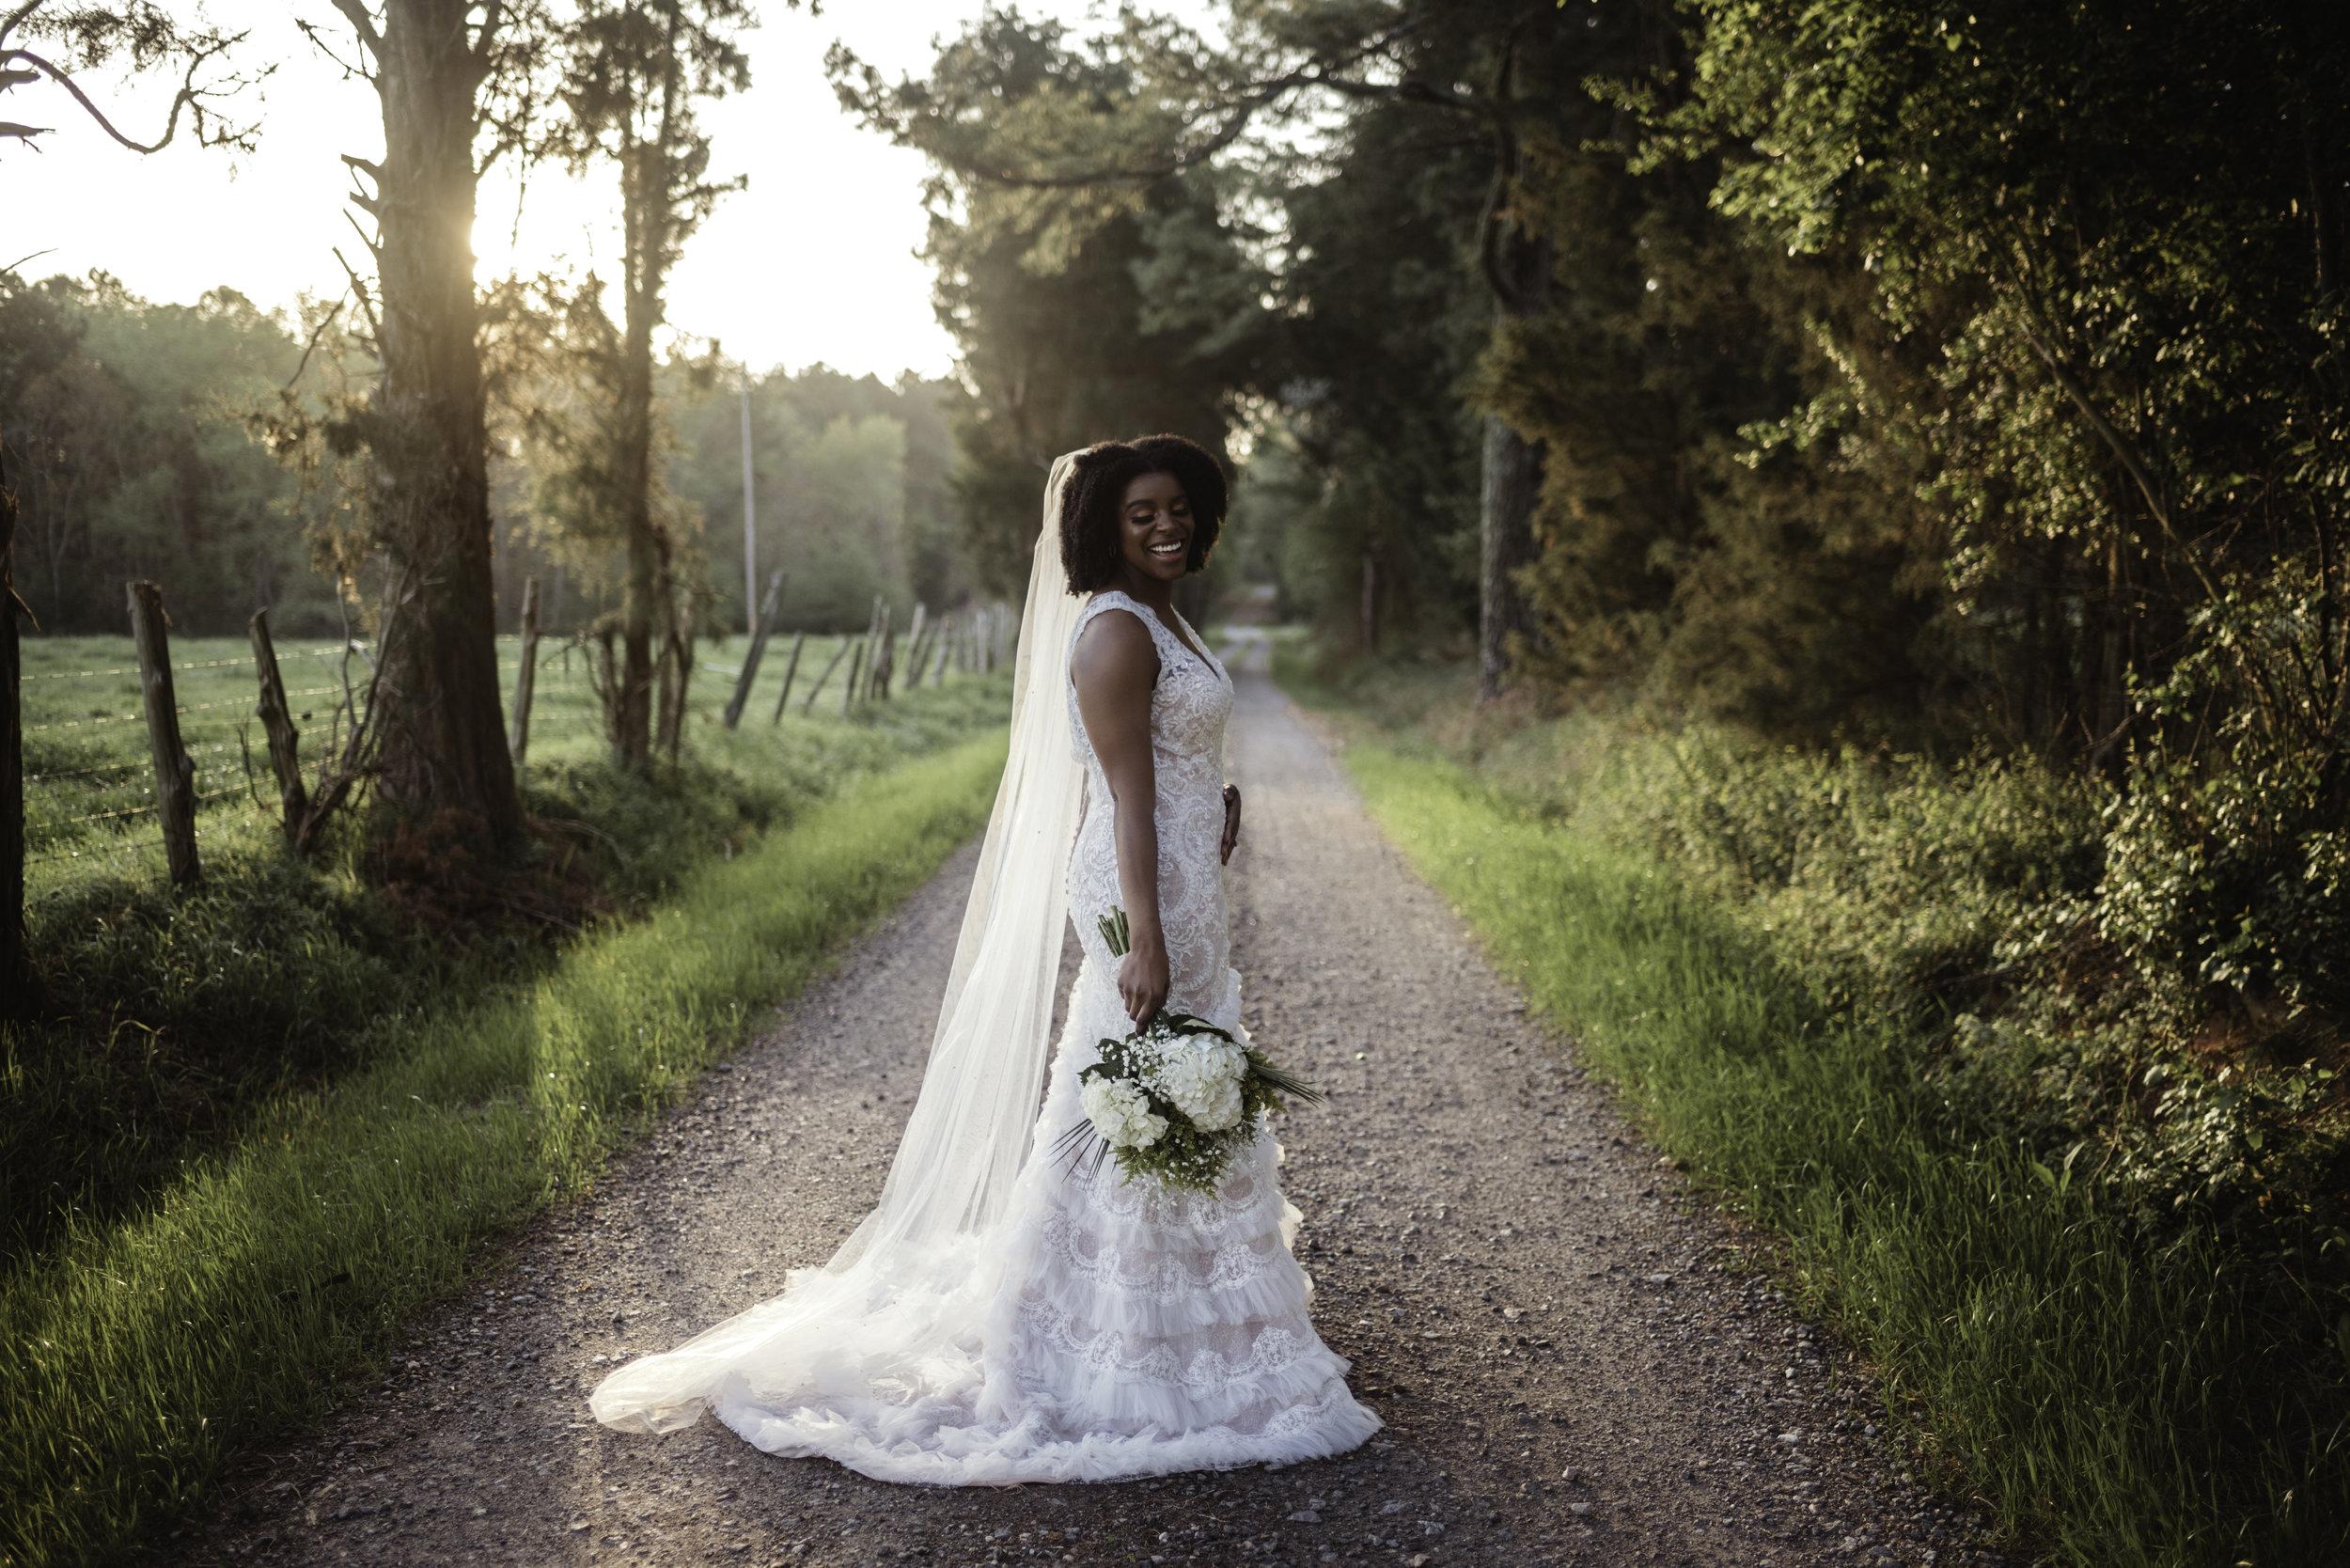 rai bridal - Click here to view